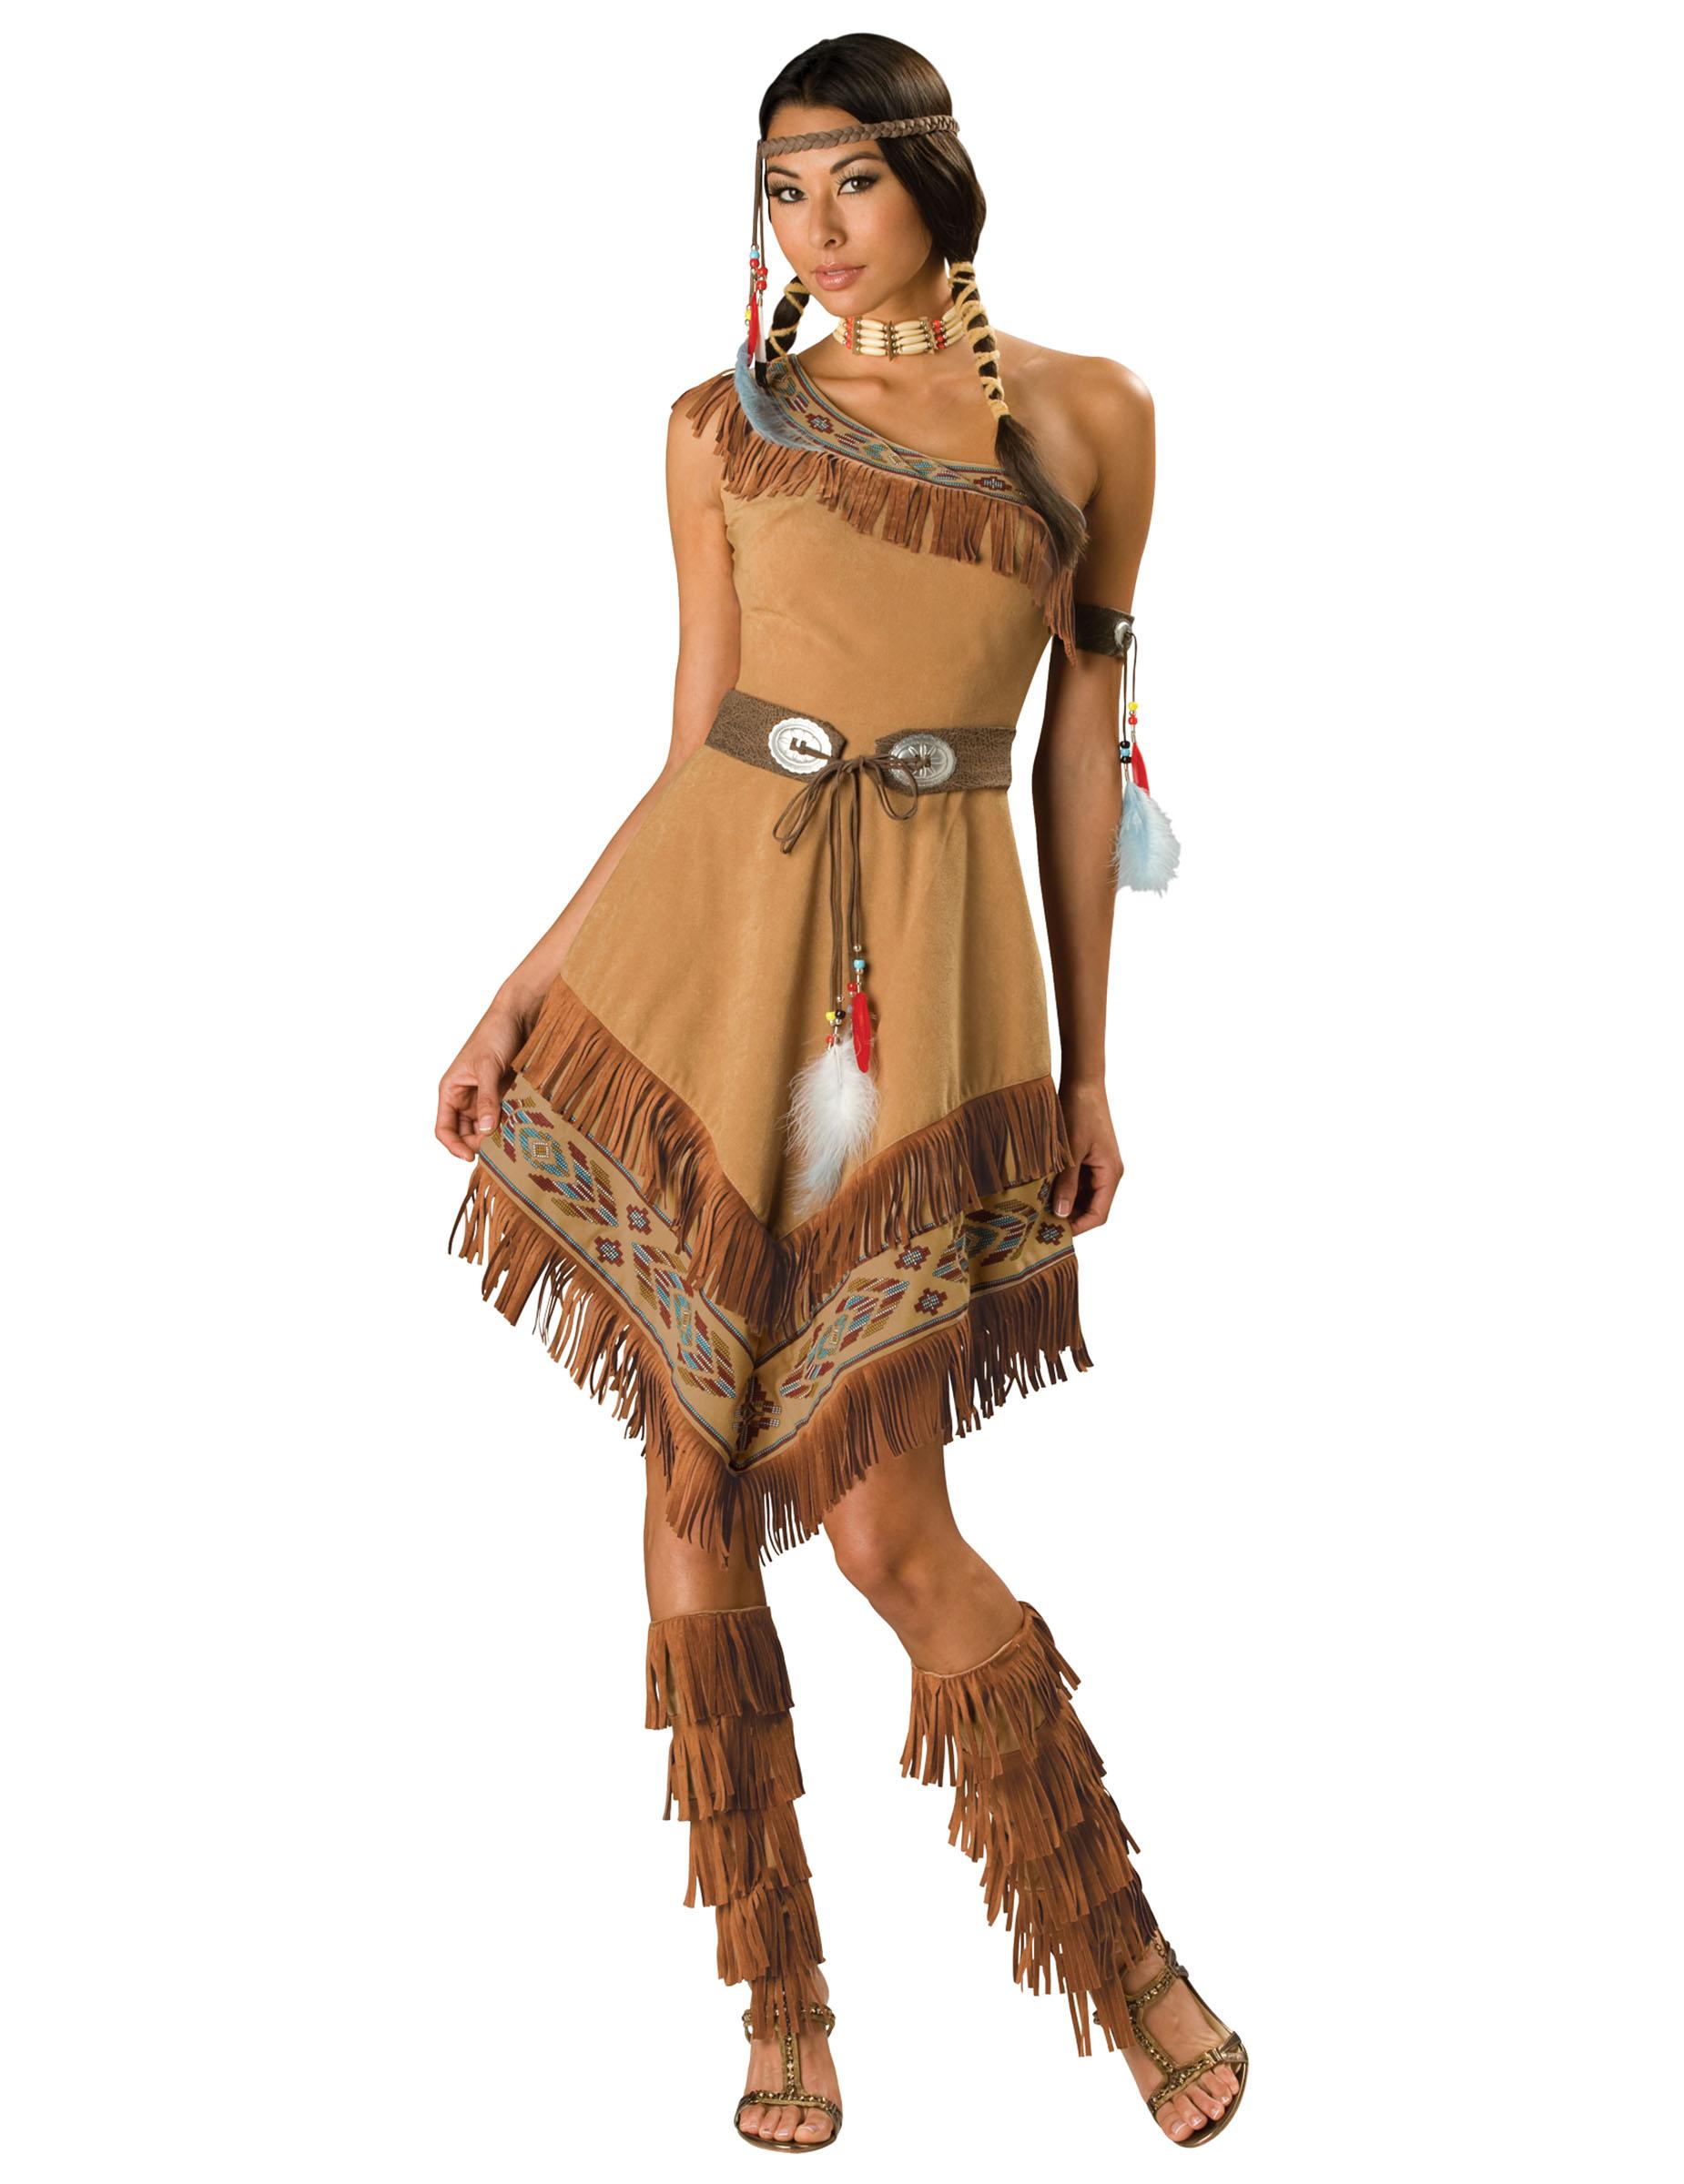 Carnavalskleding Dames Indiaan.Prachtig Indianen Carnavalskleding Voor Dames Vegaoo Nl